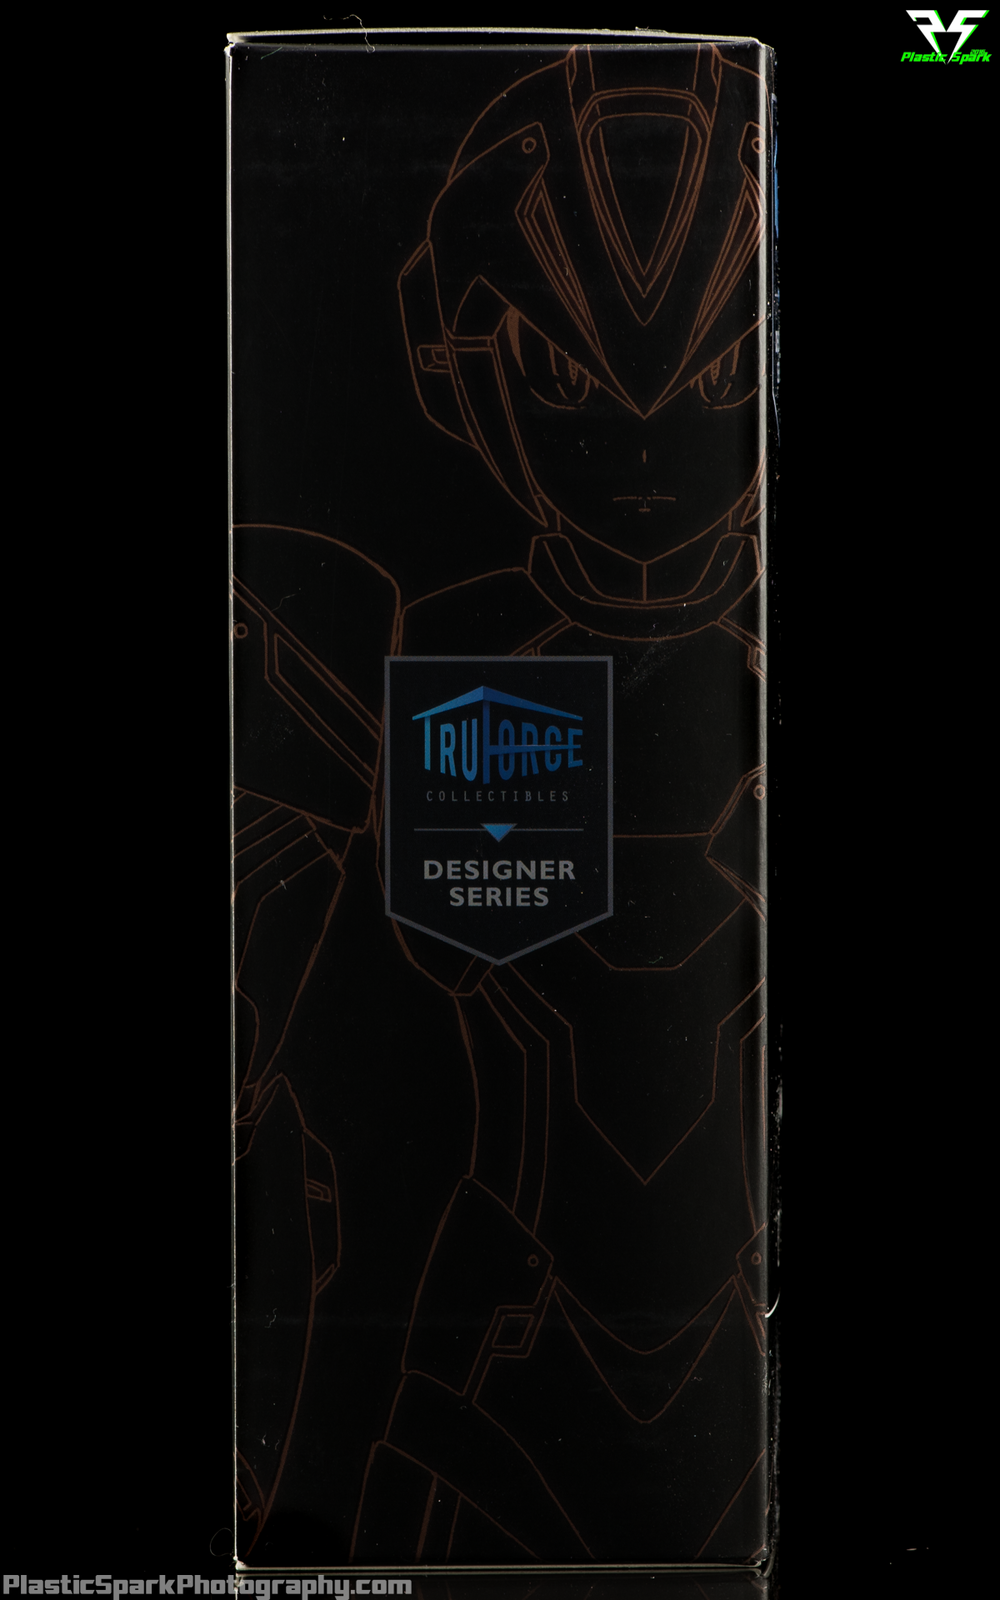 Truforce-Megaman-X-Kickstarter-Variant-Packaging-(4-of-6).png